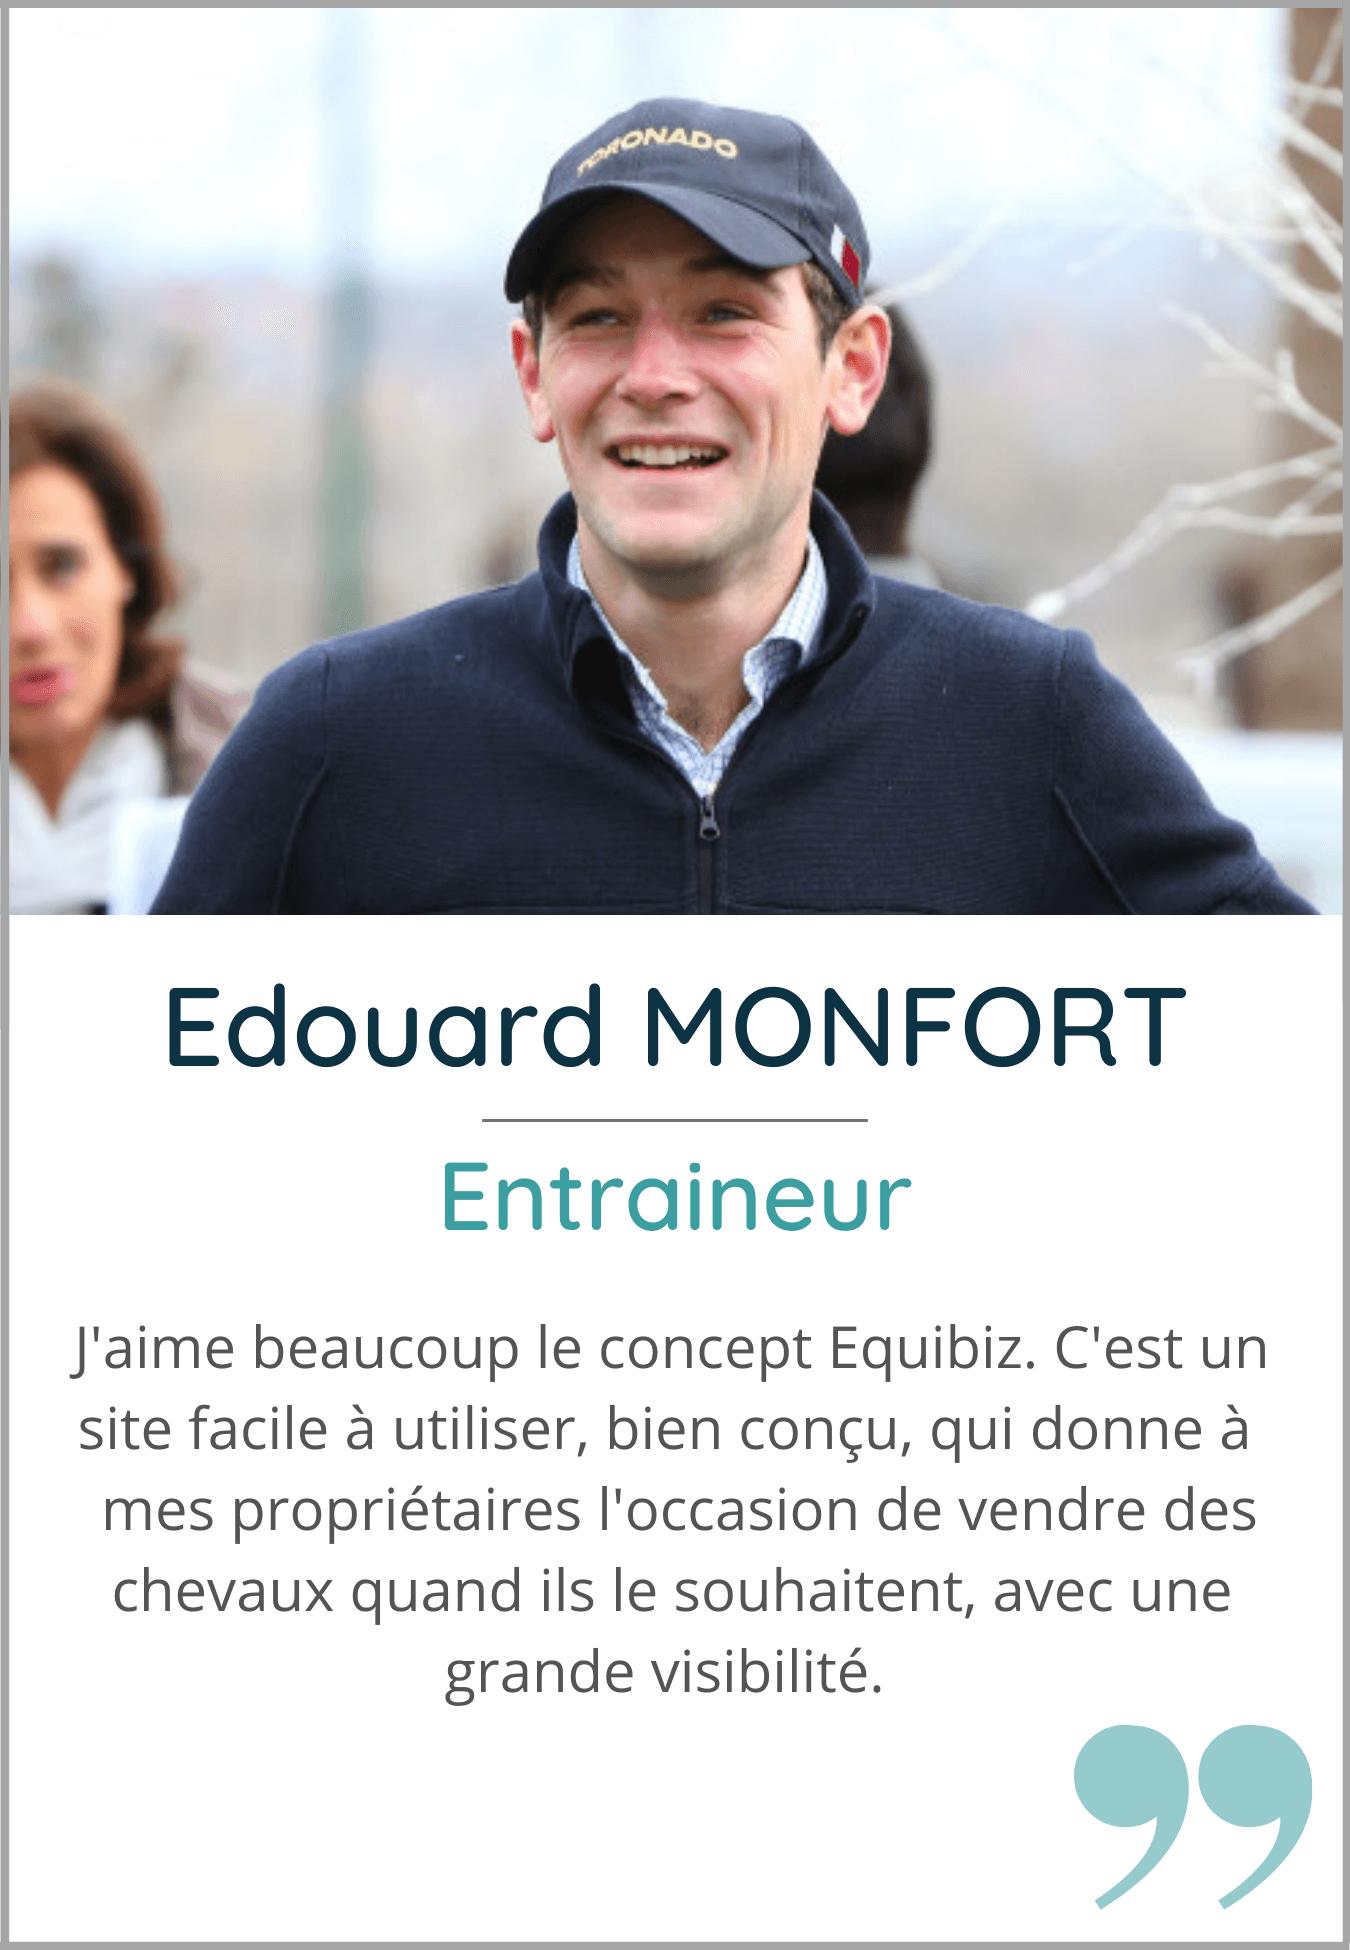 Edouard Monfort